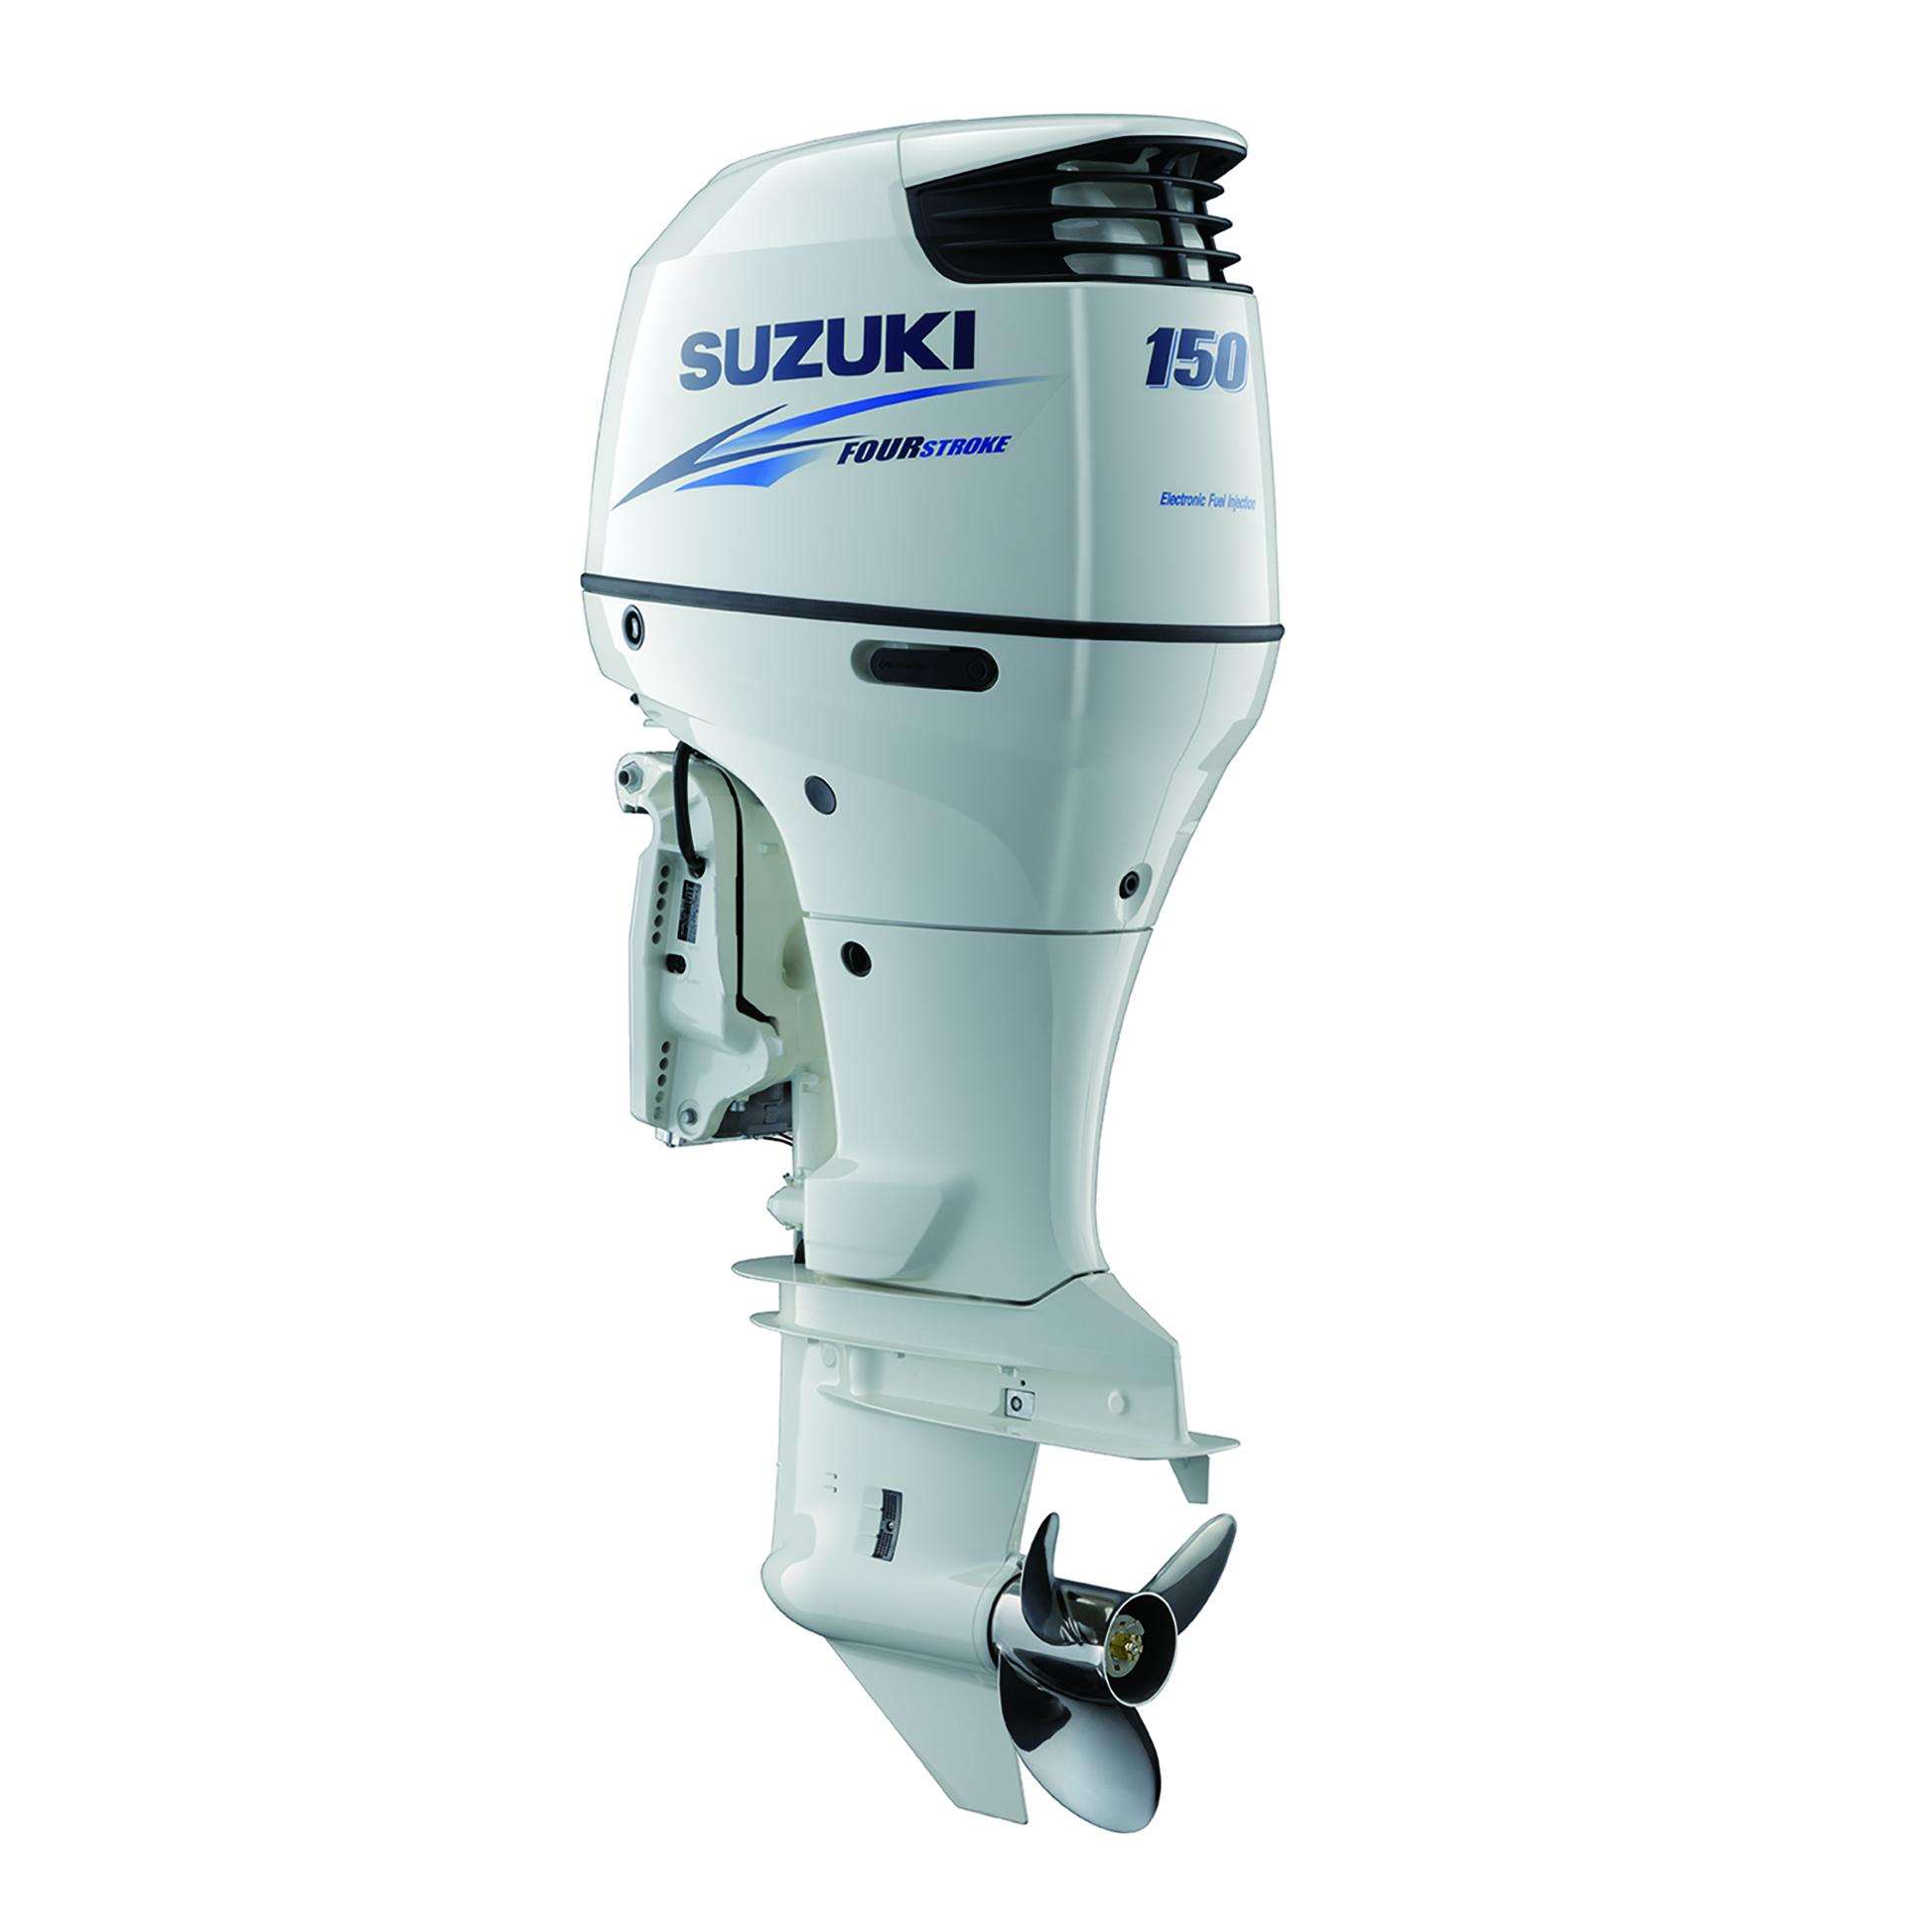 4 3 mercruiser engine maintenance 4 free engine image for Mercury outboard motor dealers